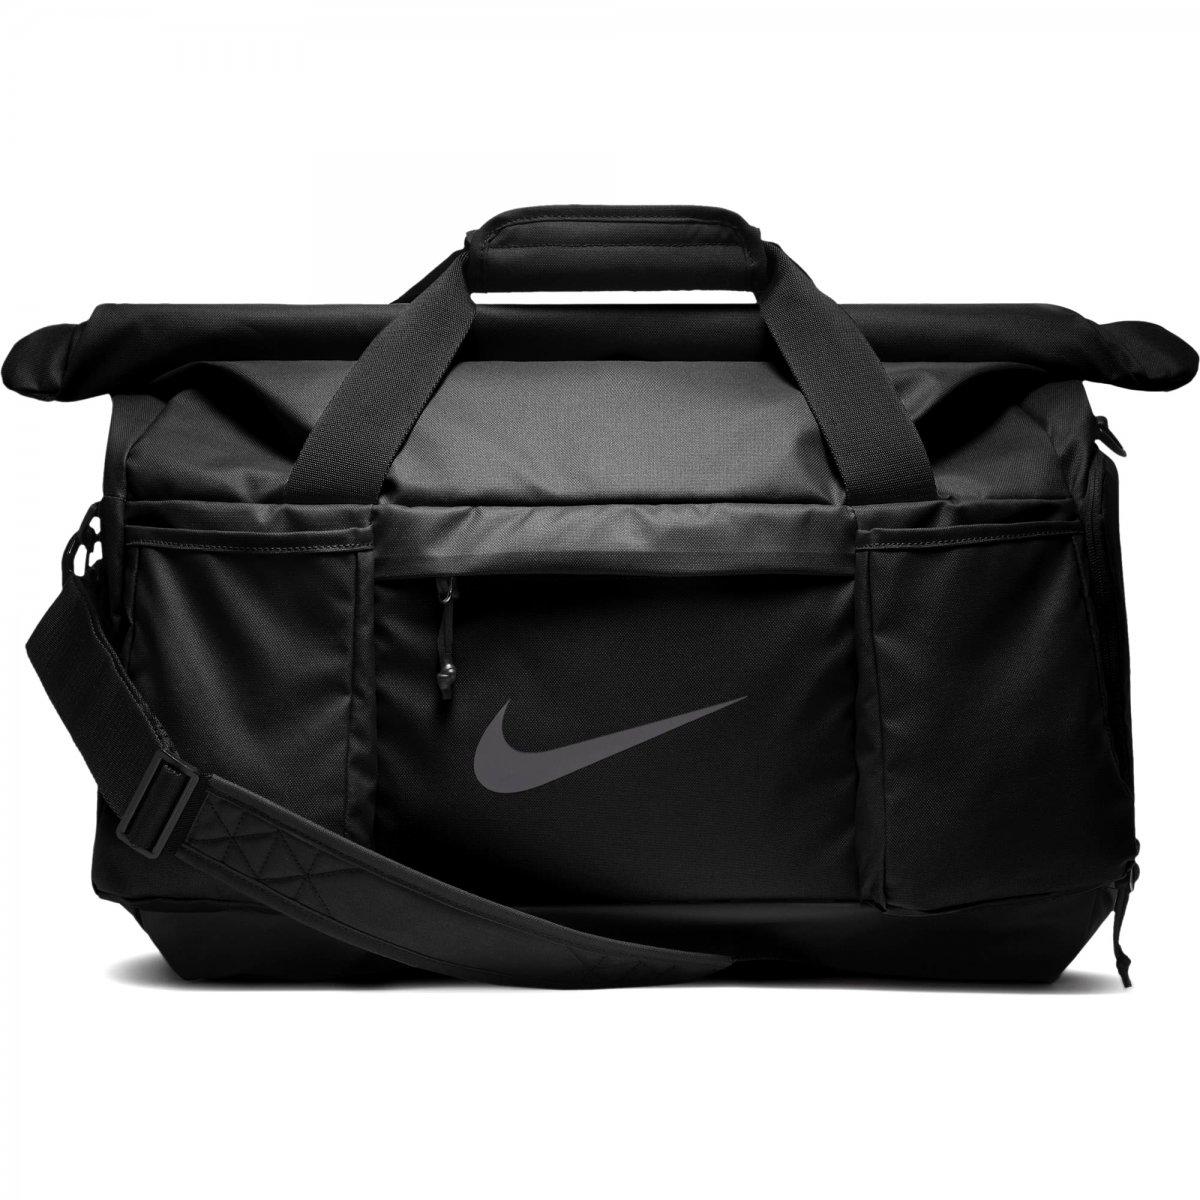 22d9e9026 Passe o mouse na imagem para ampliar Ampliar imagem. Bolsa Nike Vapor Speed  Duffel ...